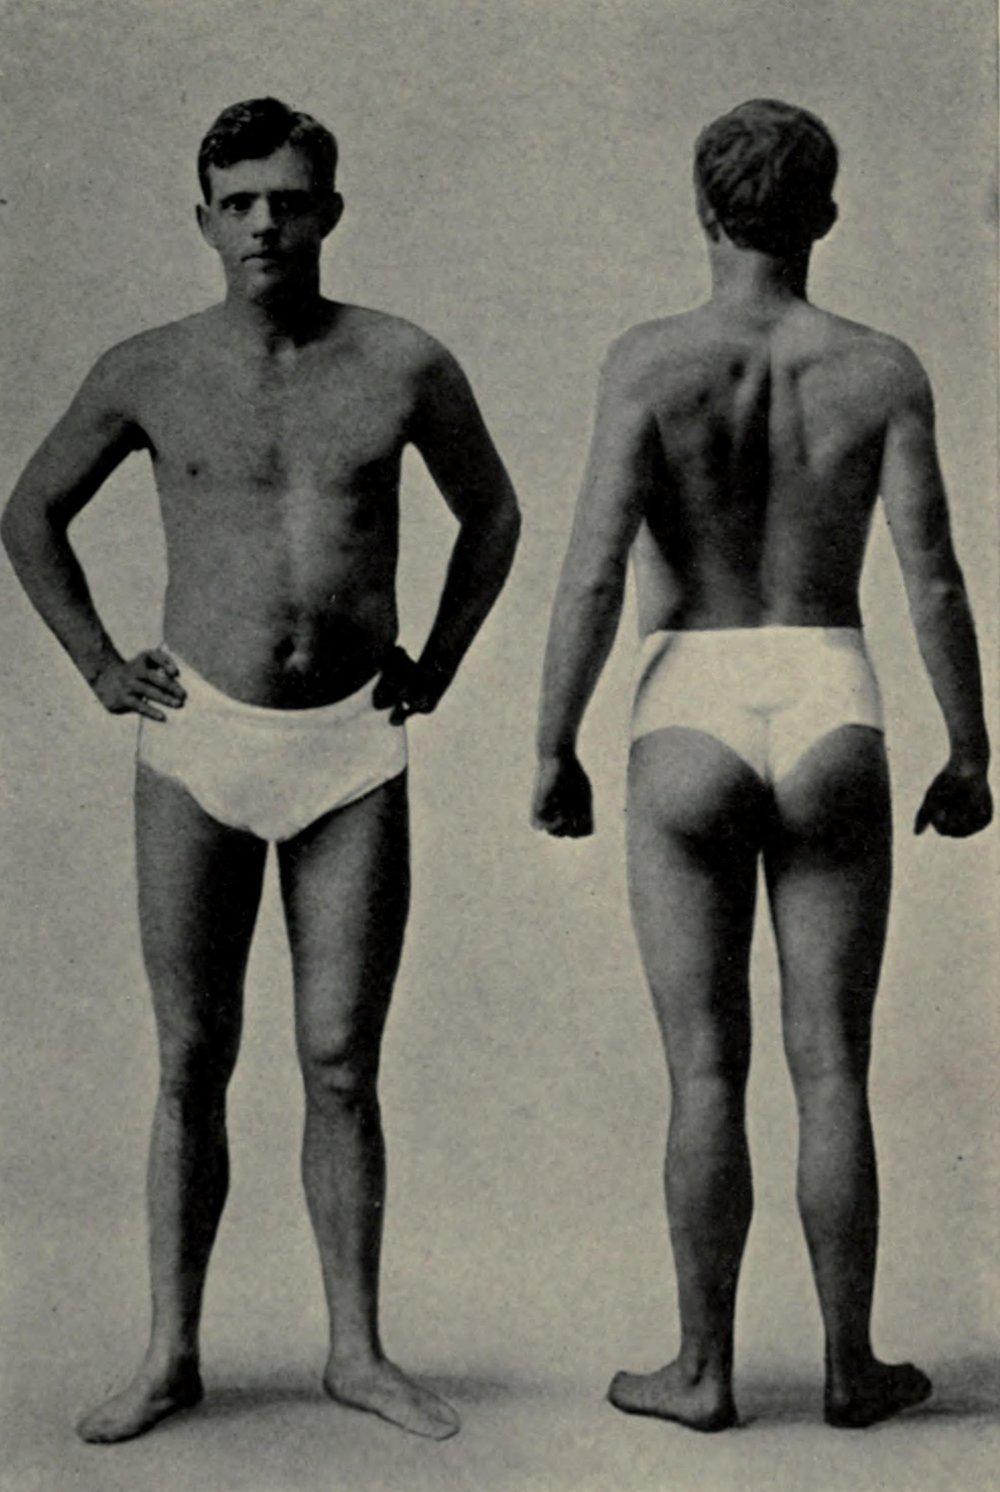 Jack_London in mutande_1904.jpg